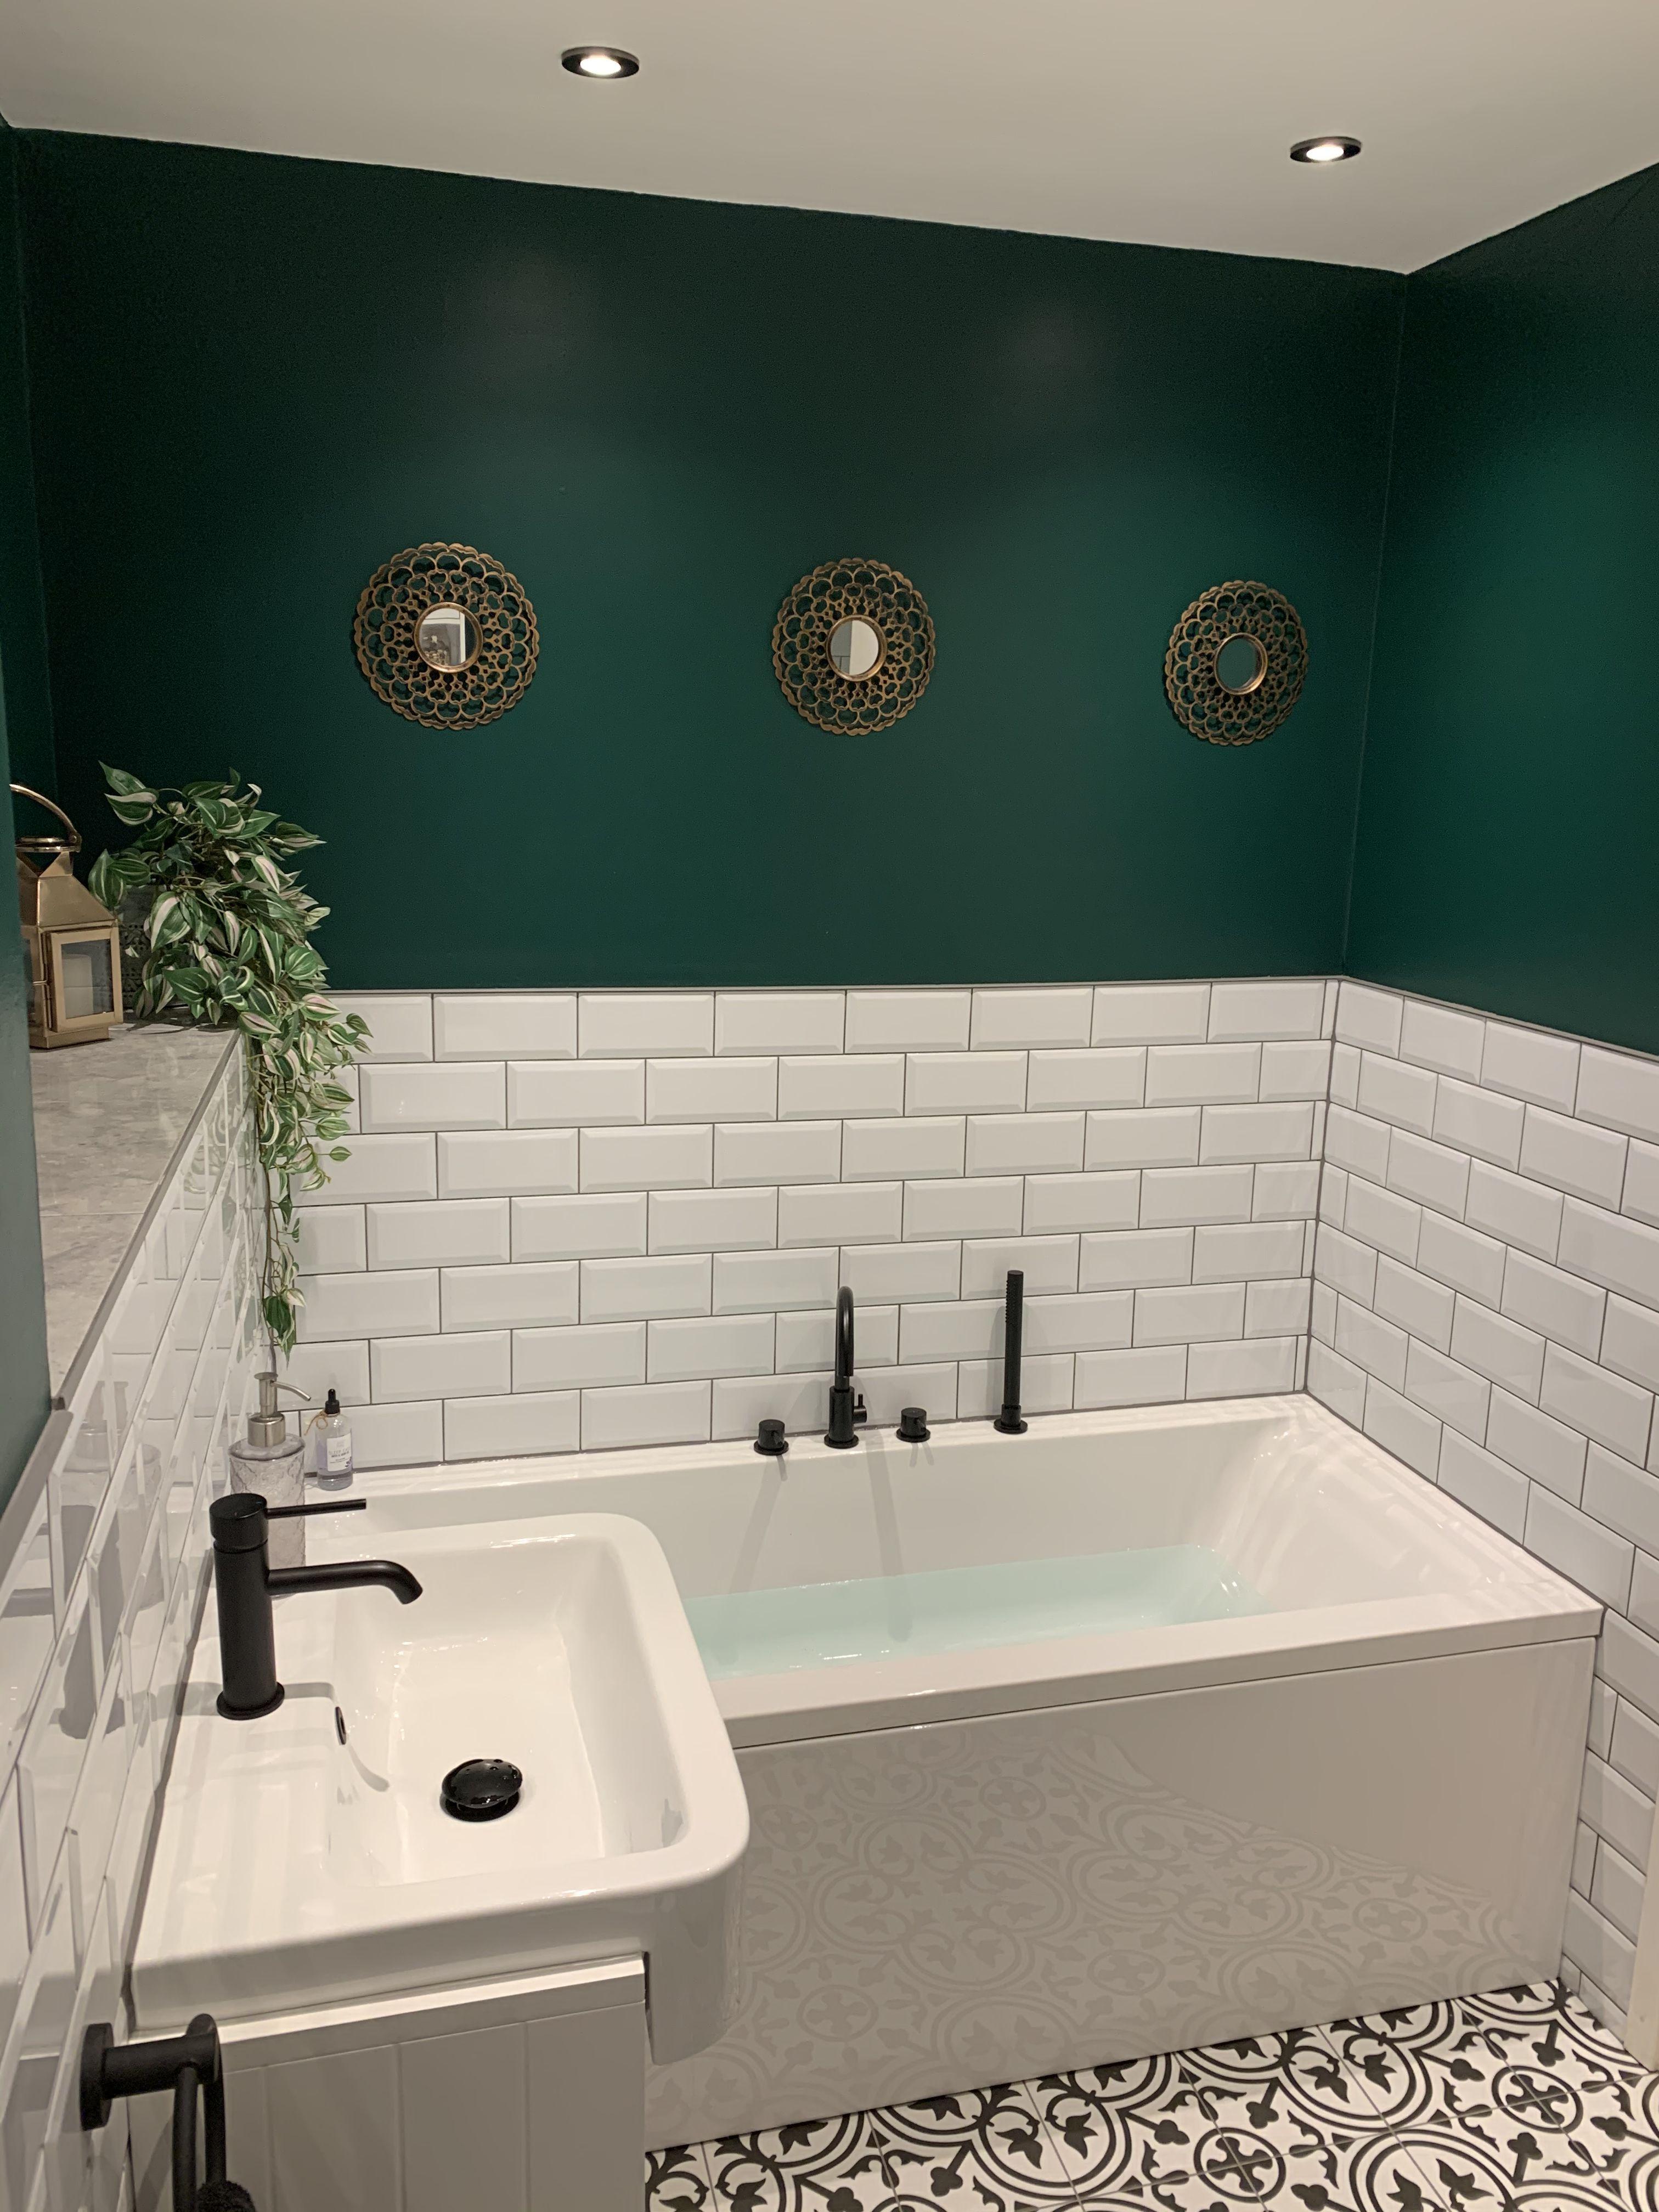 Dark Green Bathroom Badevaerelse Bathroom Dark In 2020 Green Bathroom Dark Green Bathrooms Bathroom Style